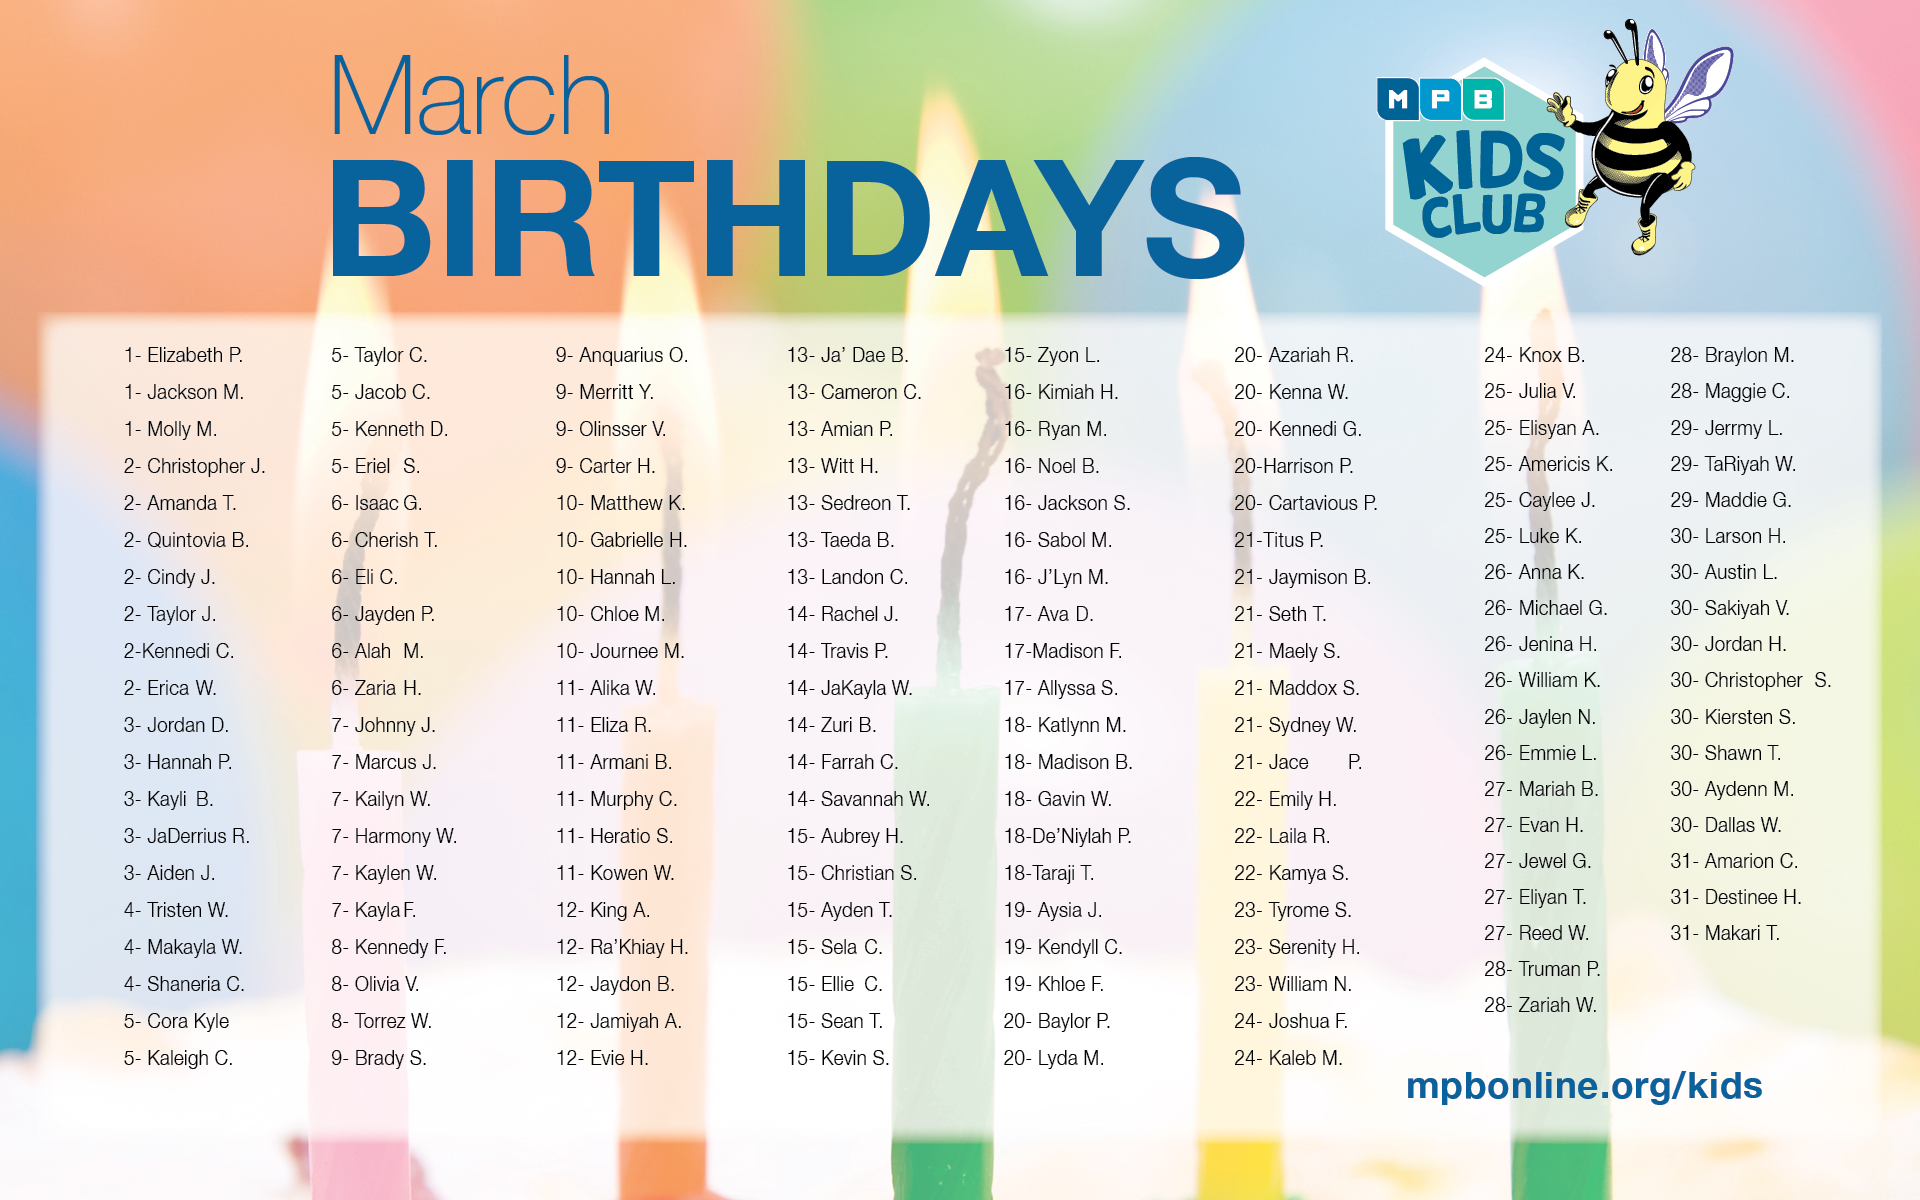 birthday_TV Kids Club March 2019.png